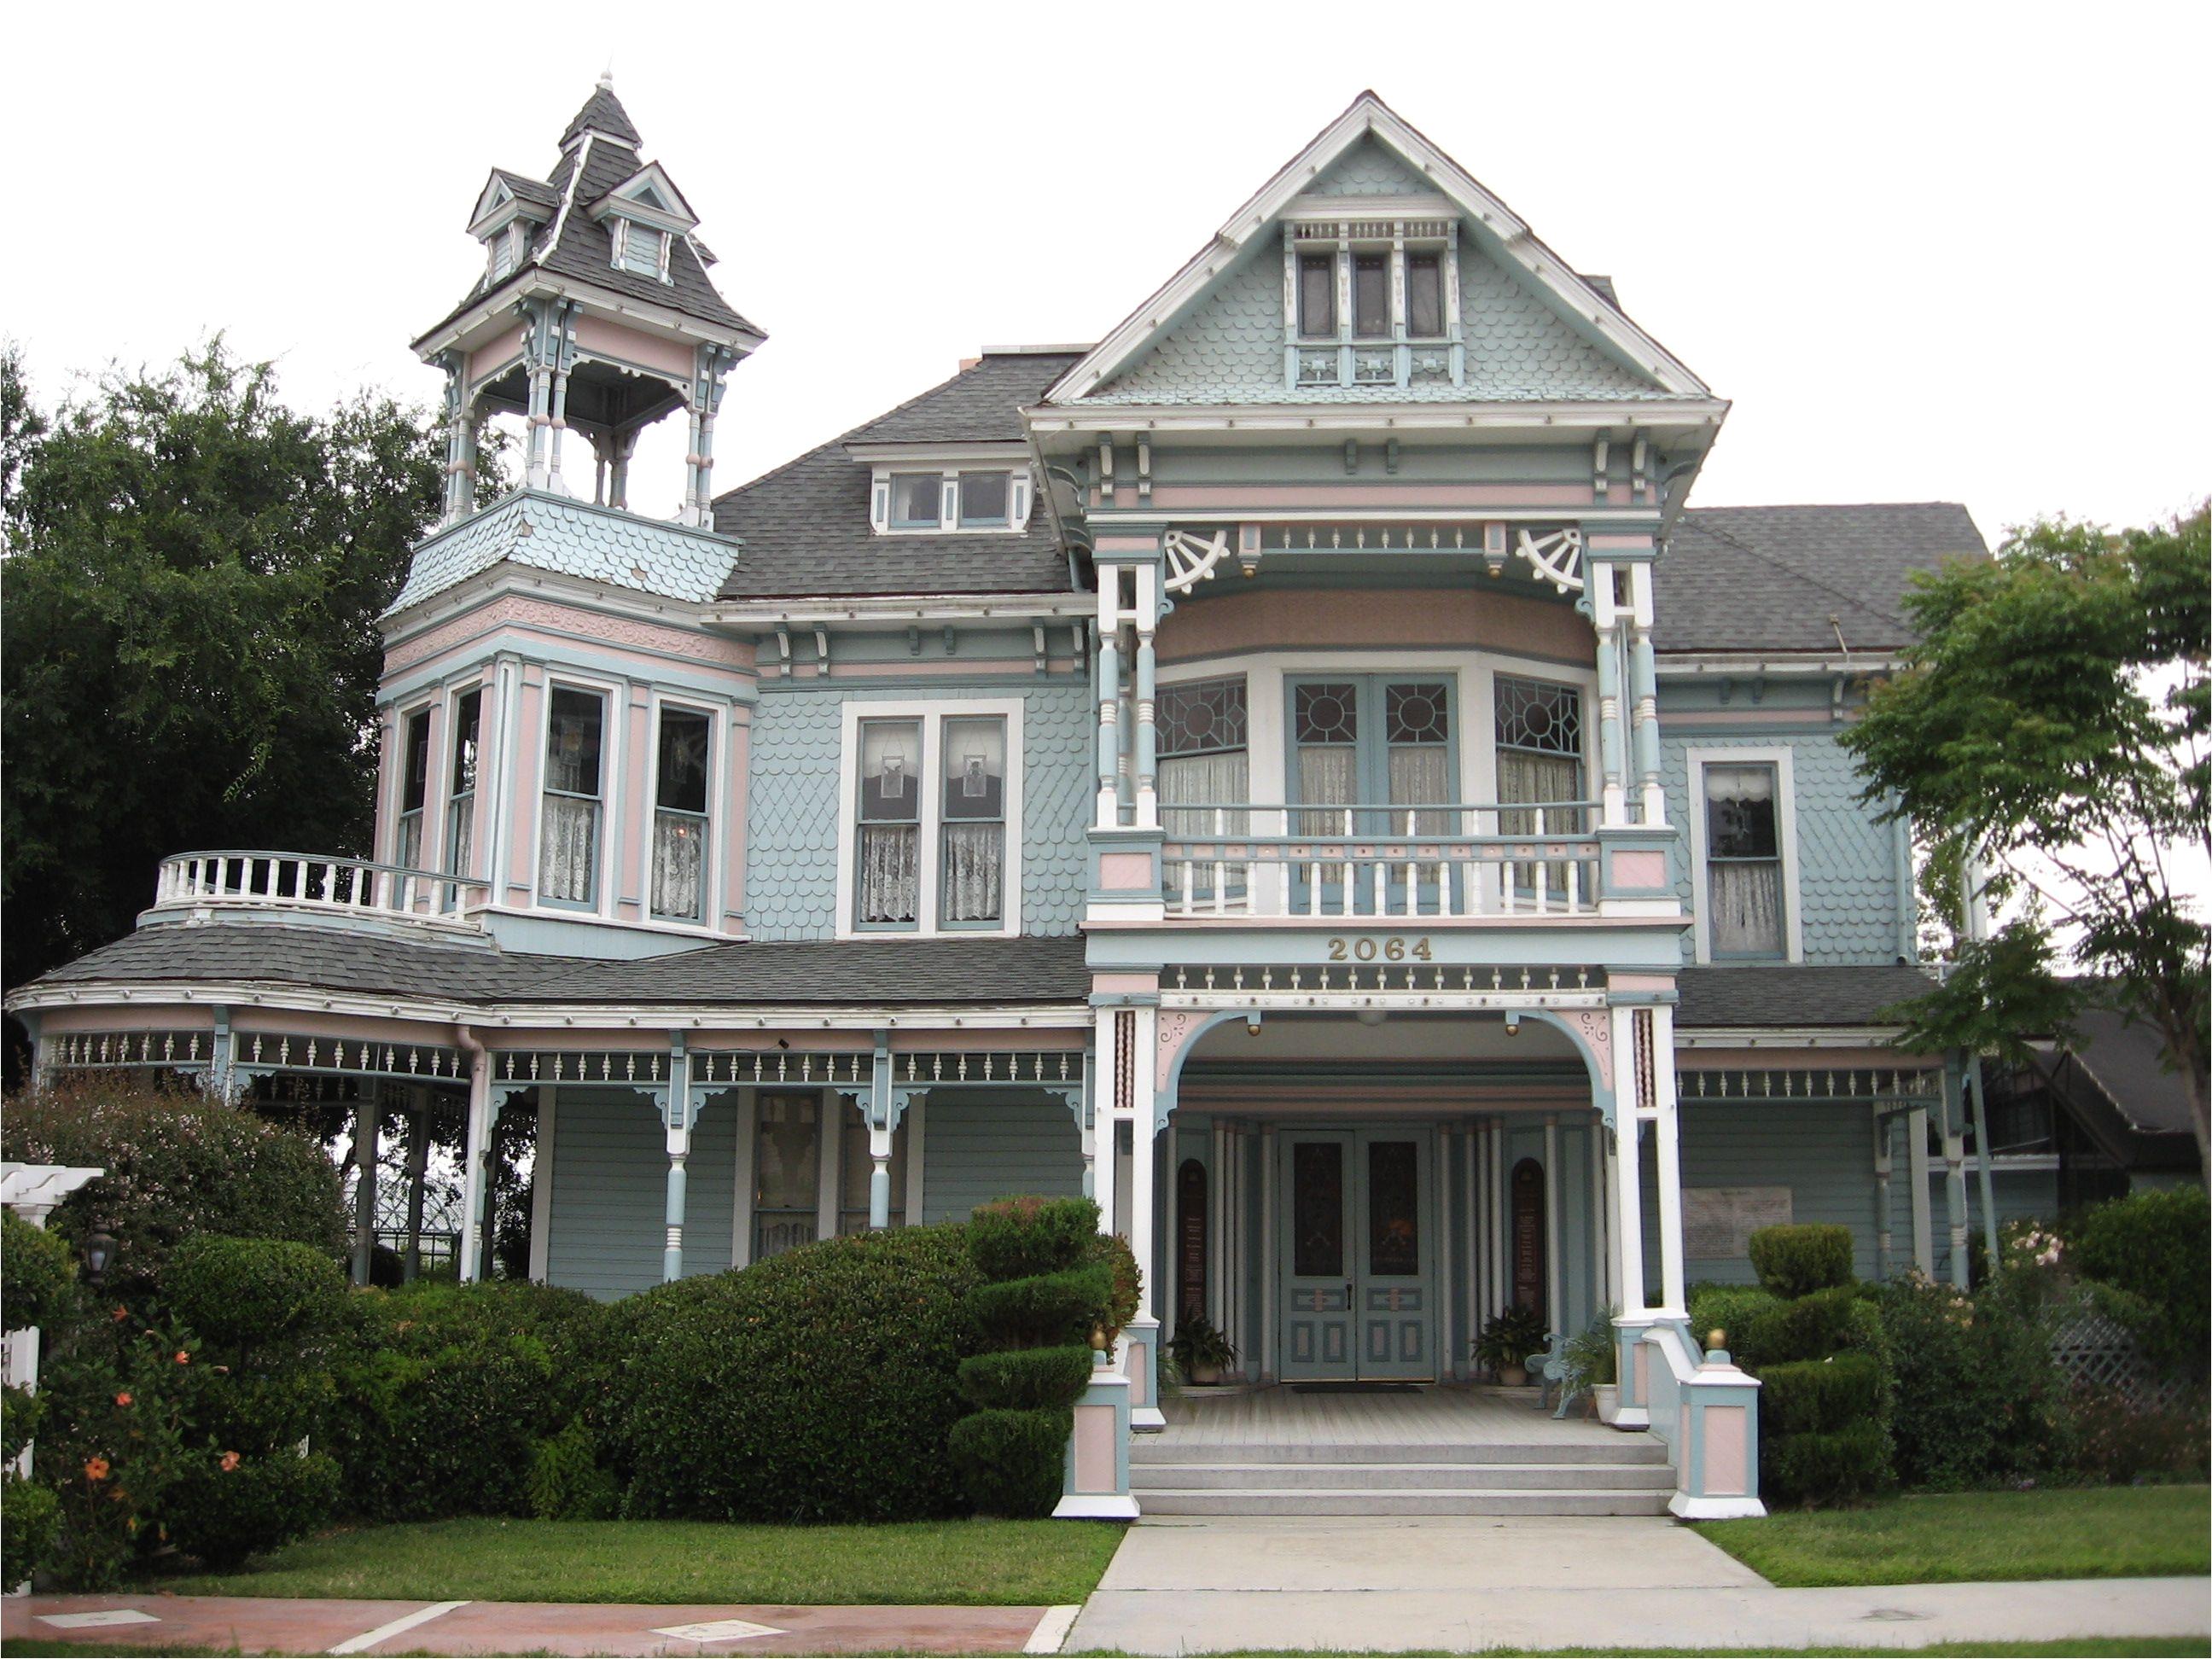 1890 edwards mansion in redlands california